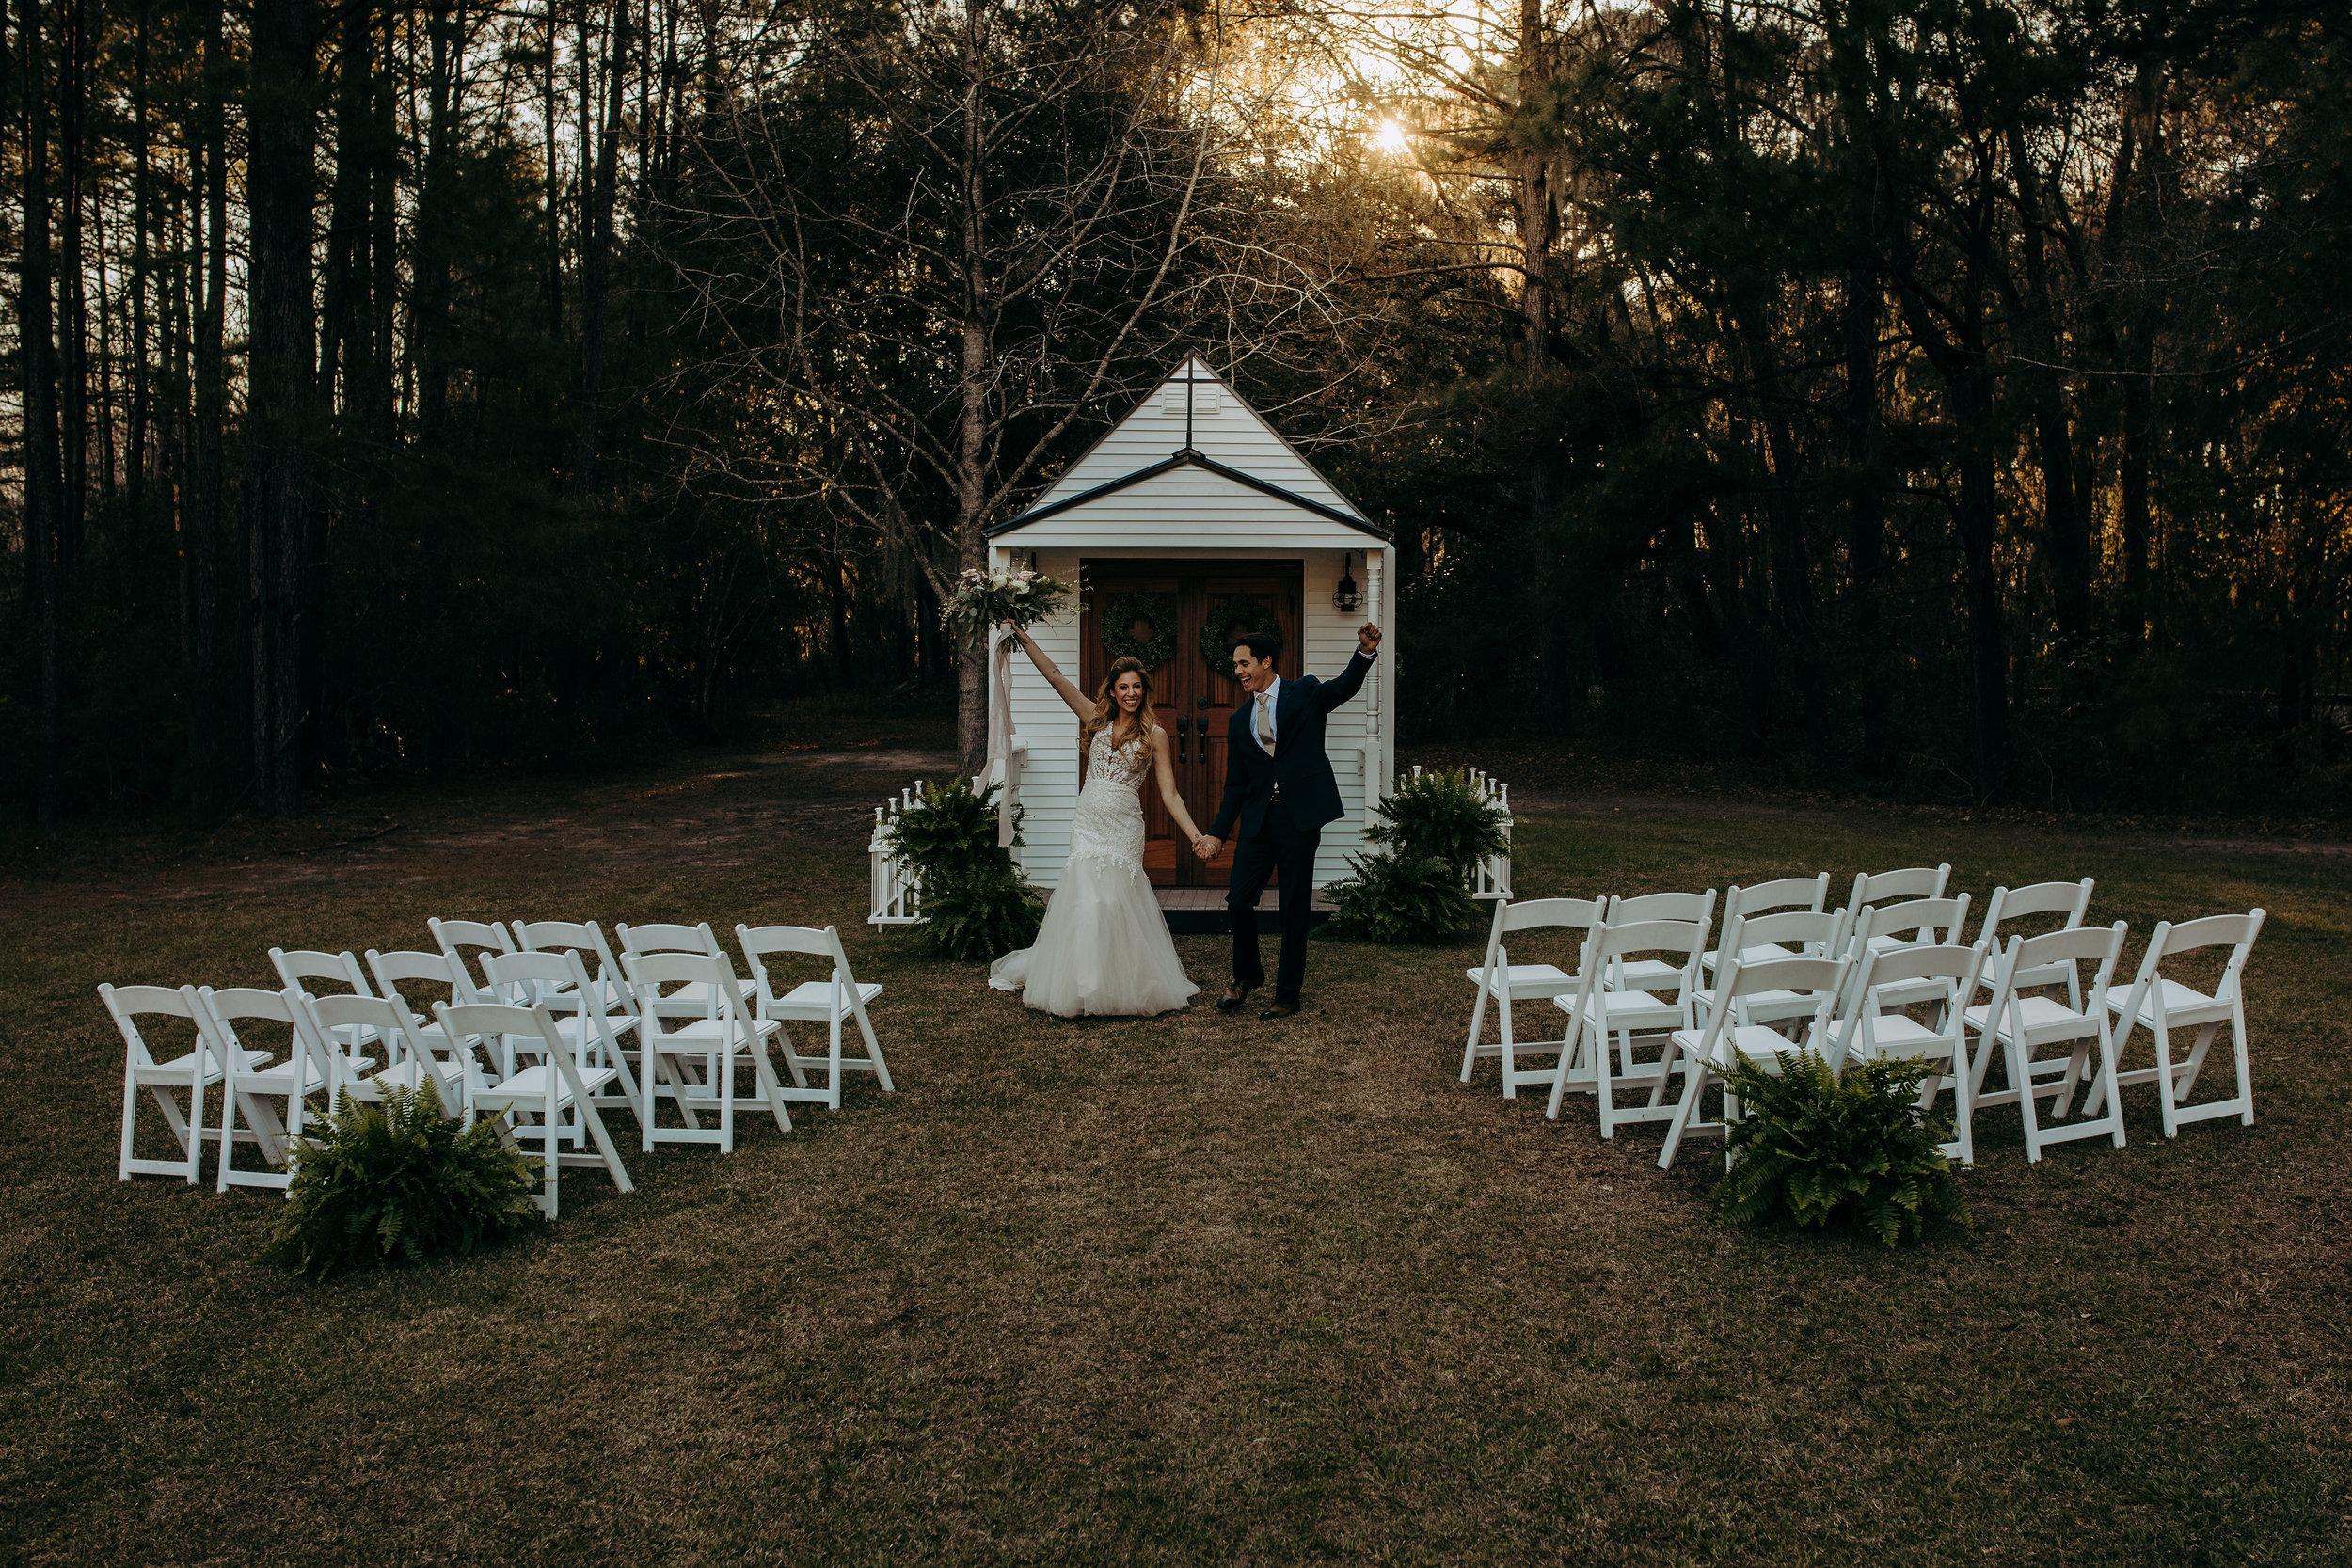 ivory-and-beau-blog-mackey-house-styled-shoot-savannah-wedding-bridal-boutique-savannah-florist-southern-wedding-_G5A2640.jpg